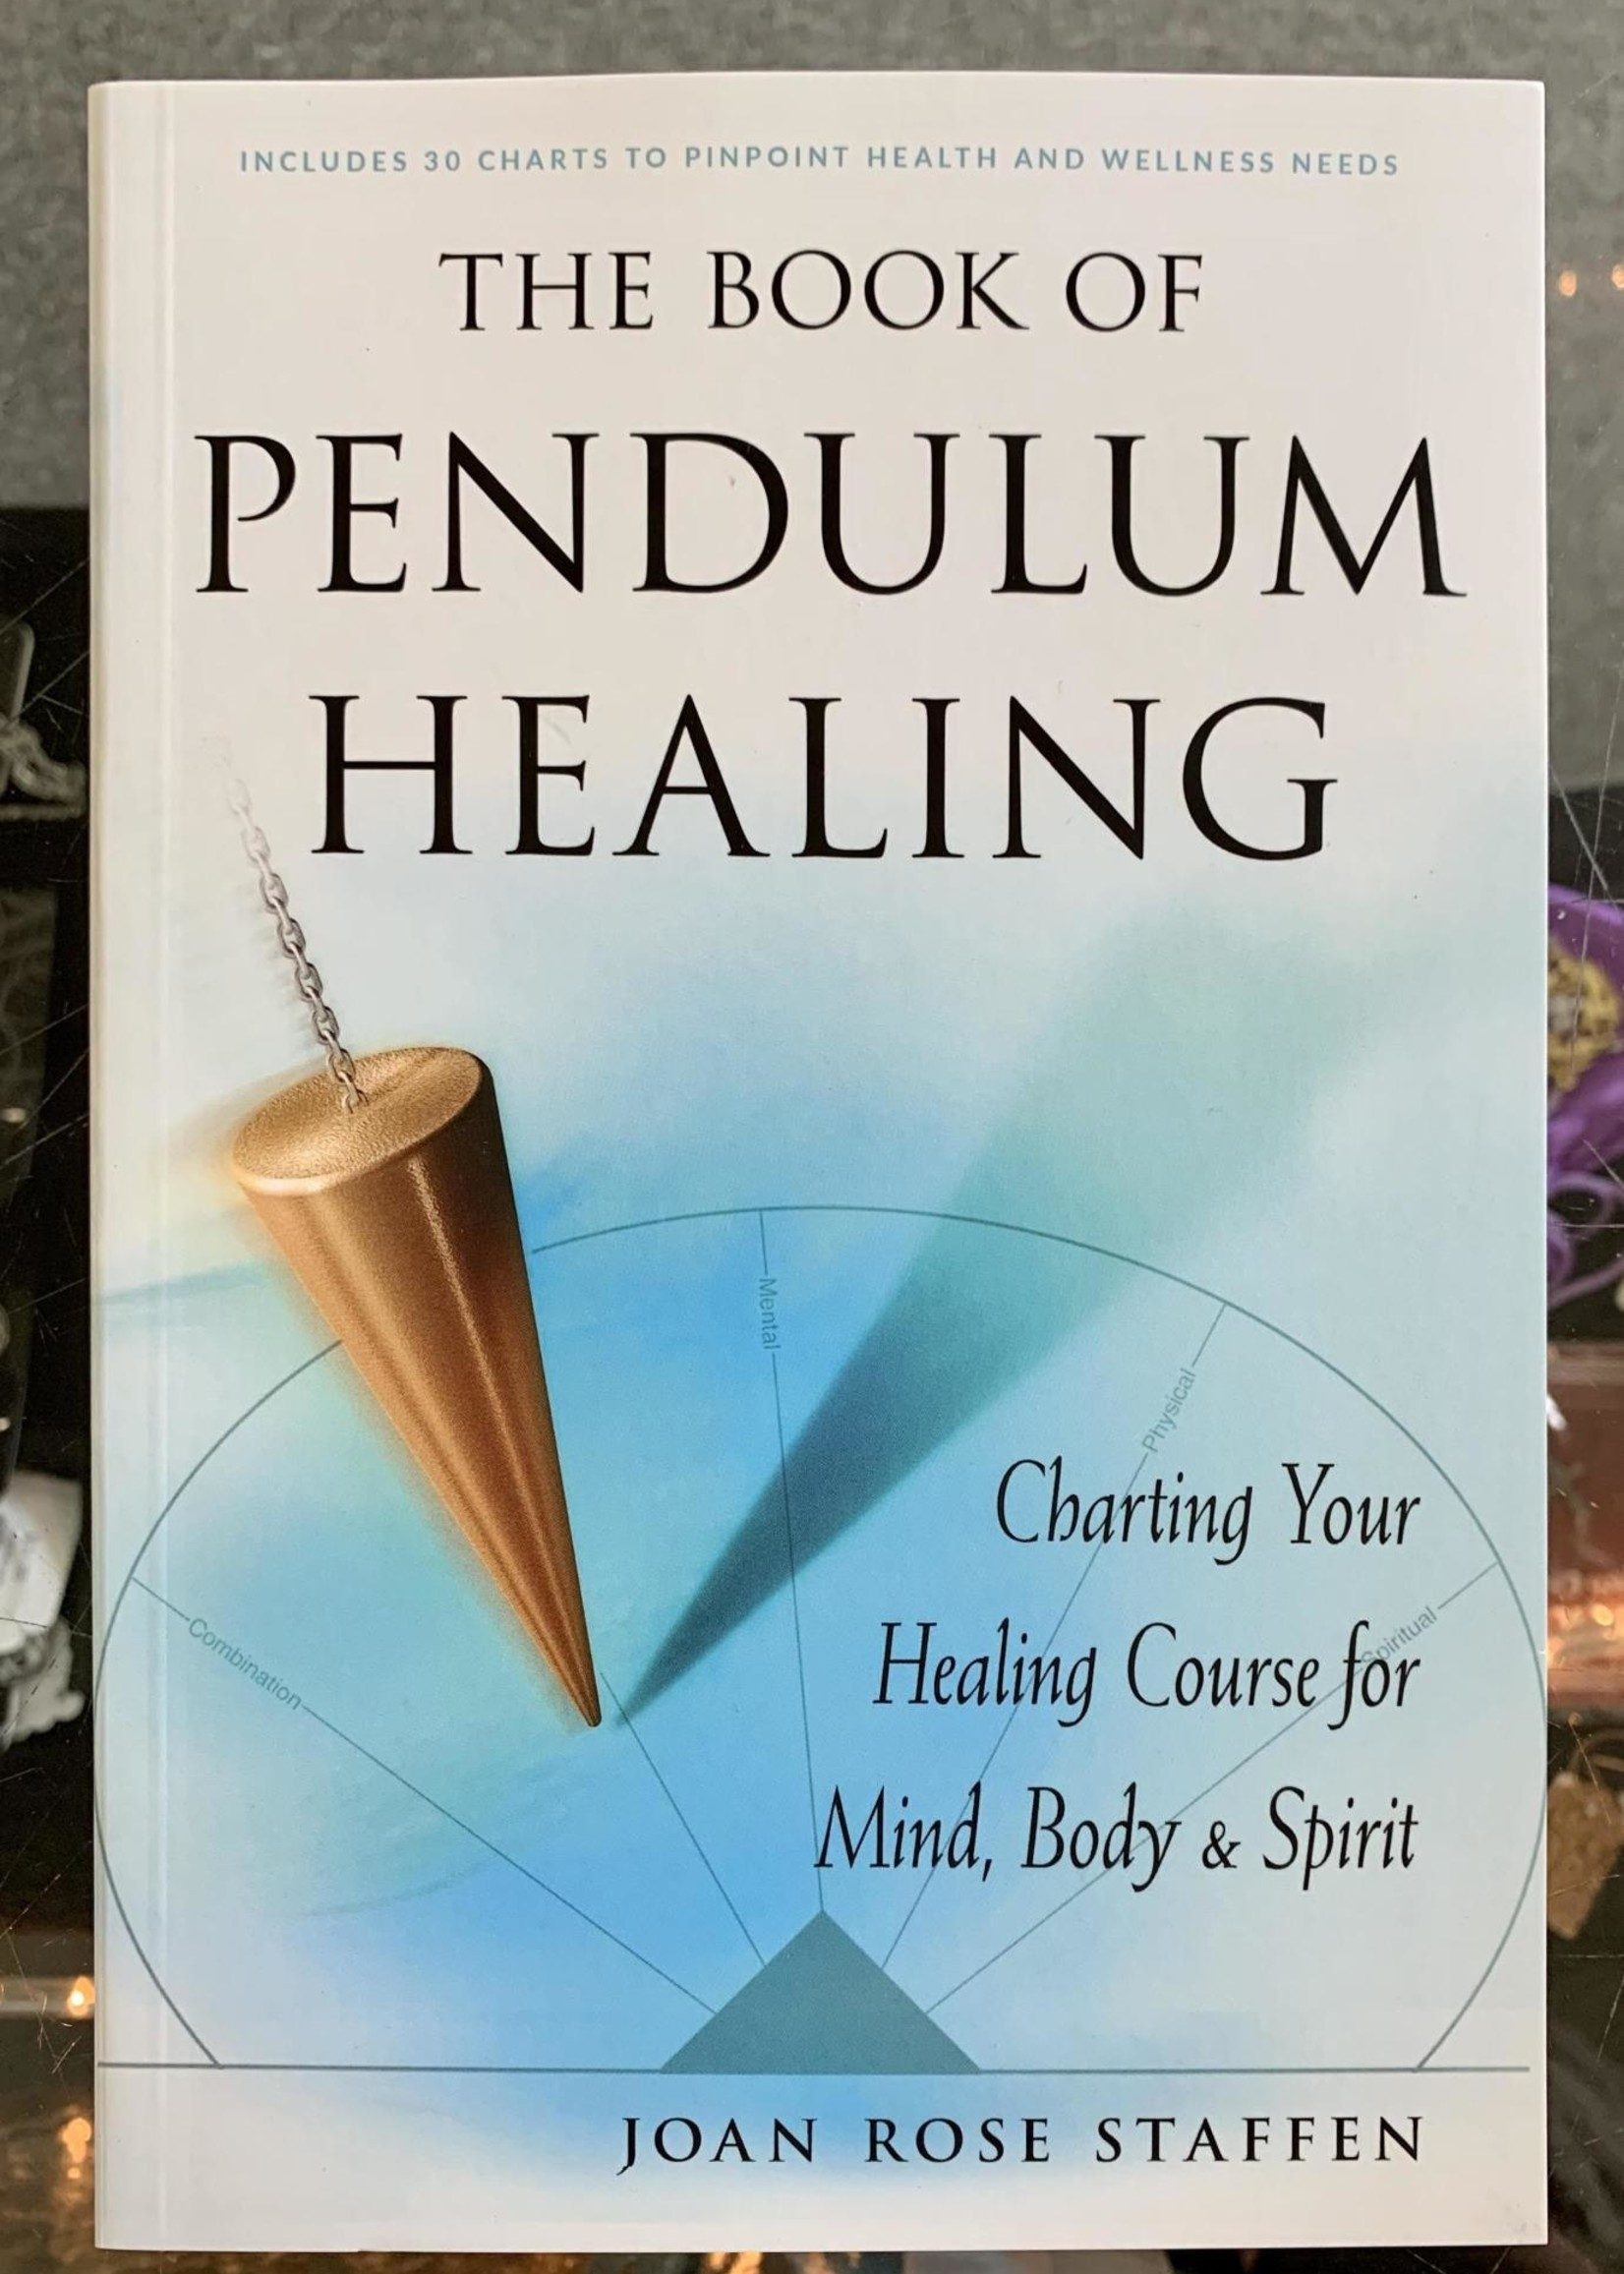 The Book of Pendulum Healing Charting Your Healing Course for Mind, Body, & Spirit - Joan Rose Staffen